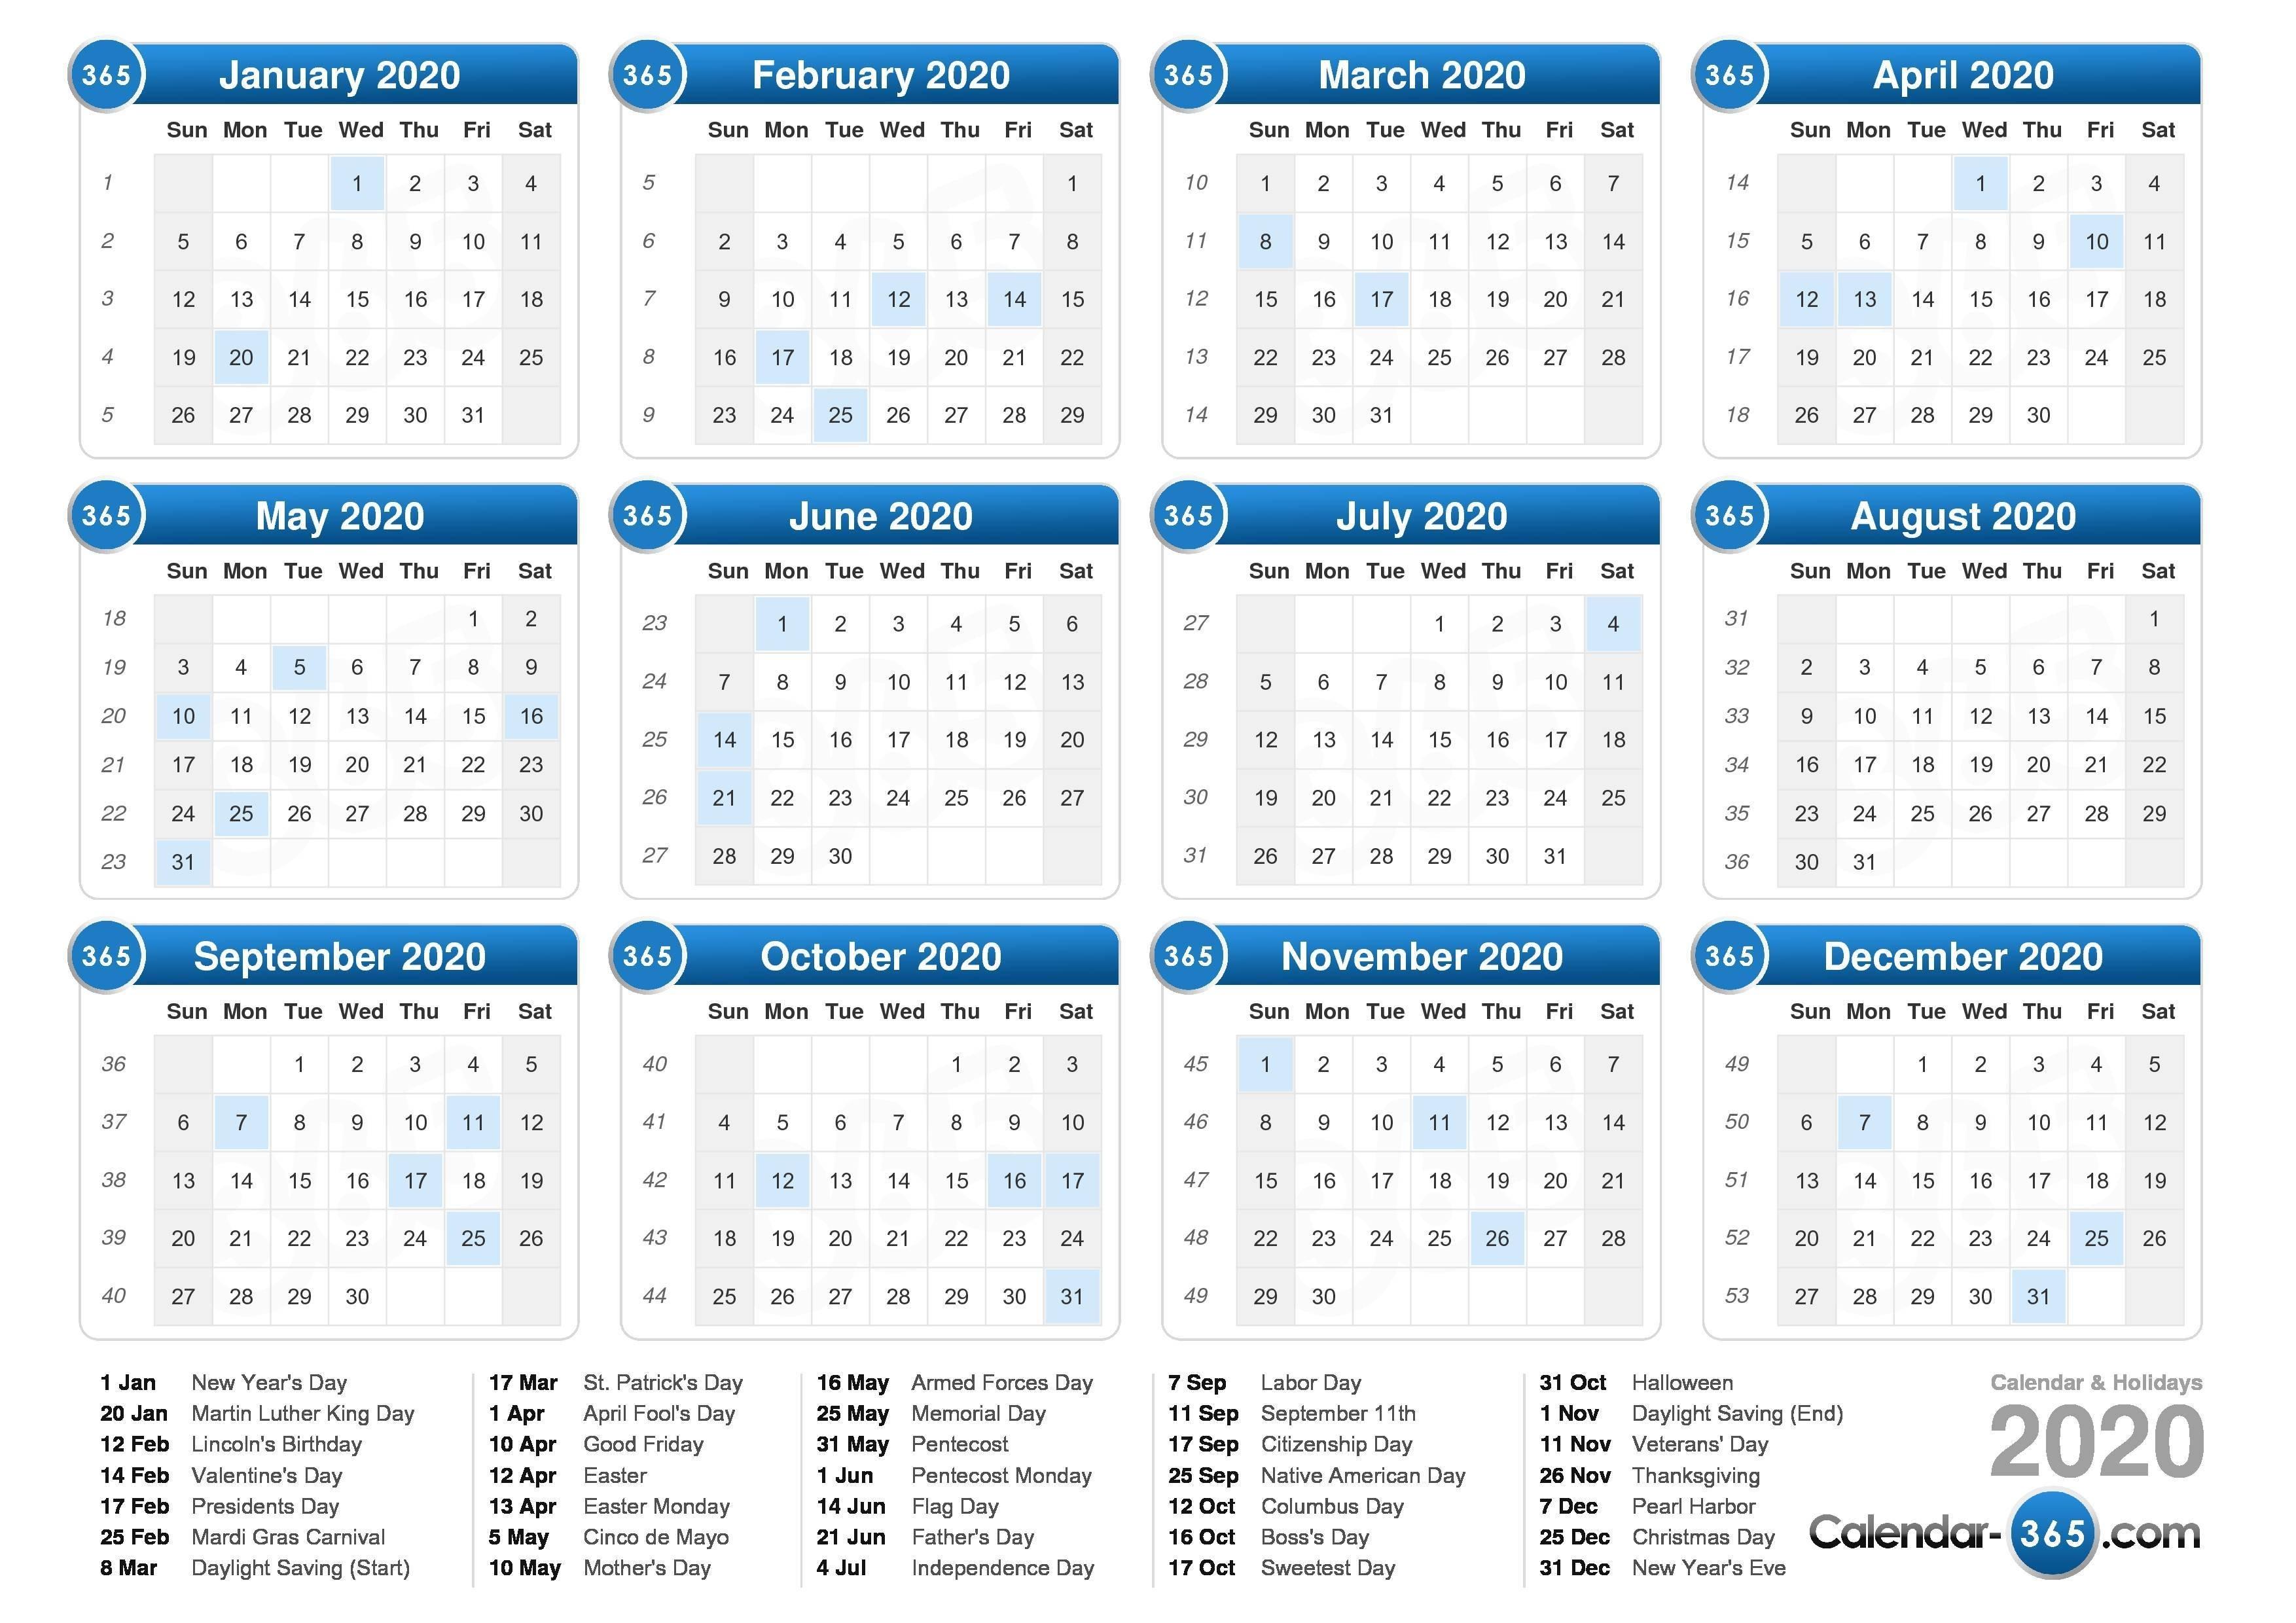 2020 Calendar-2020 Calendar With Public Holidays